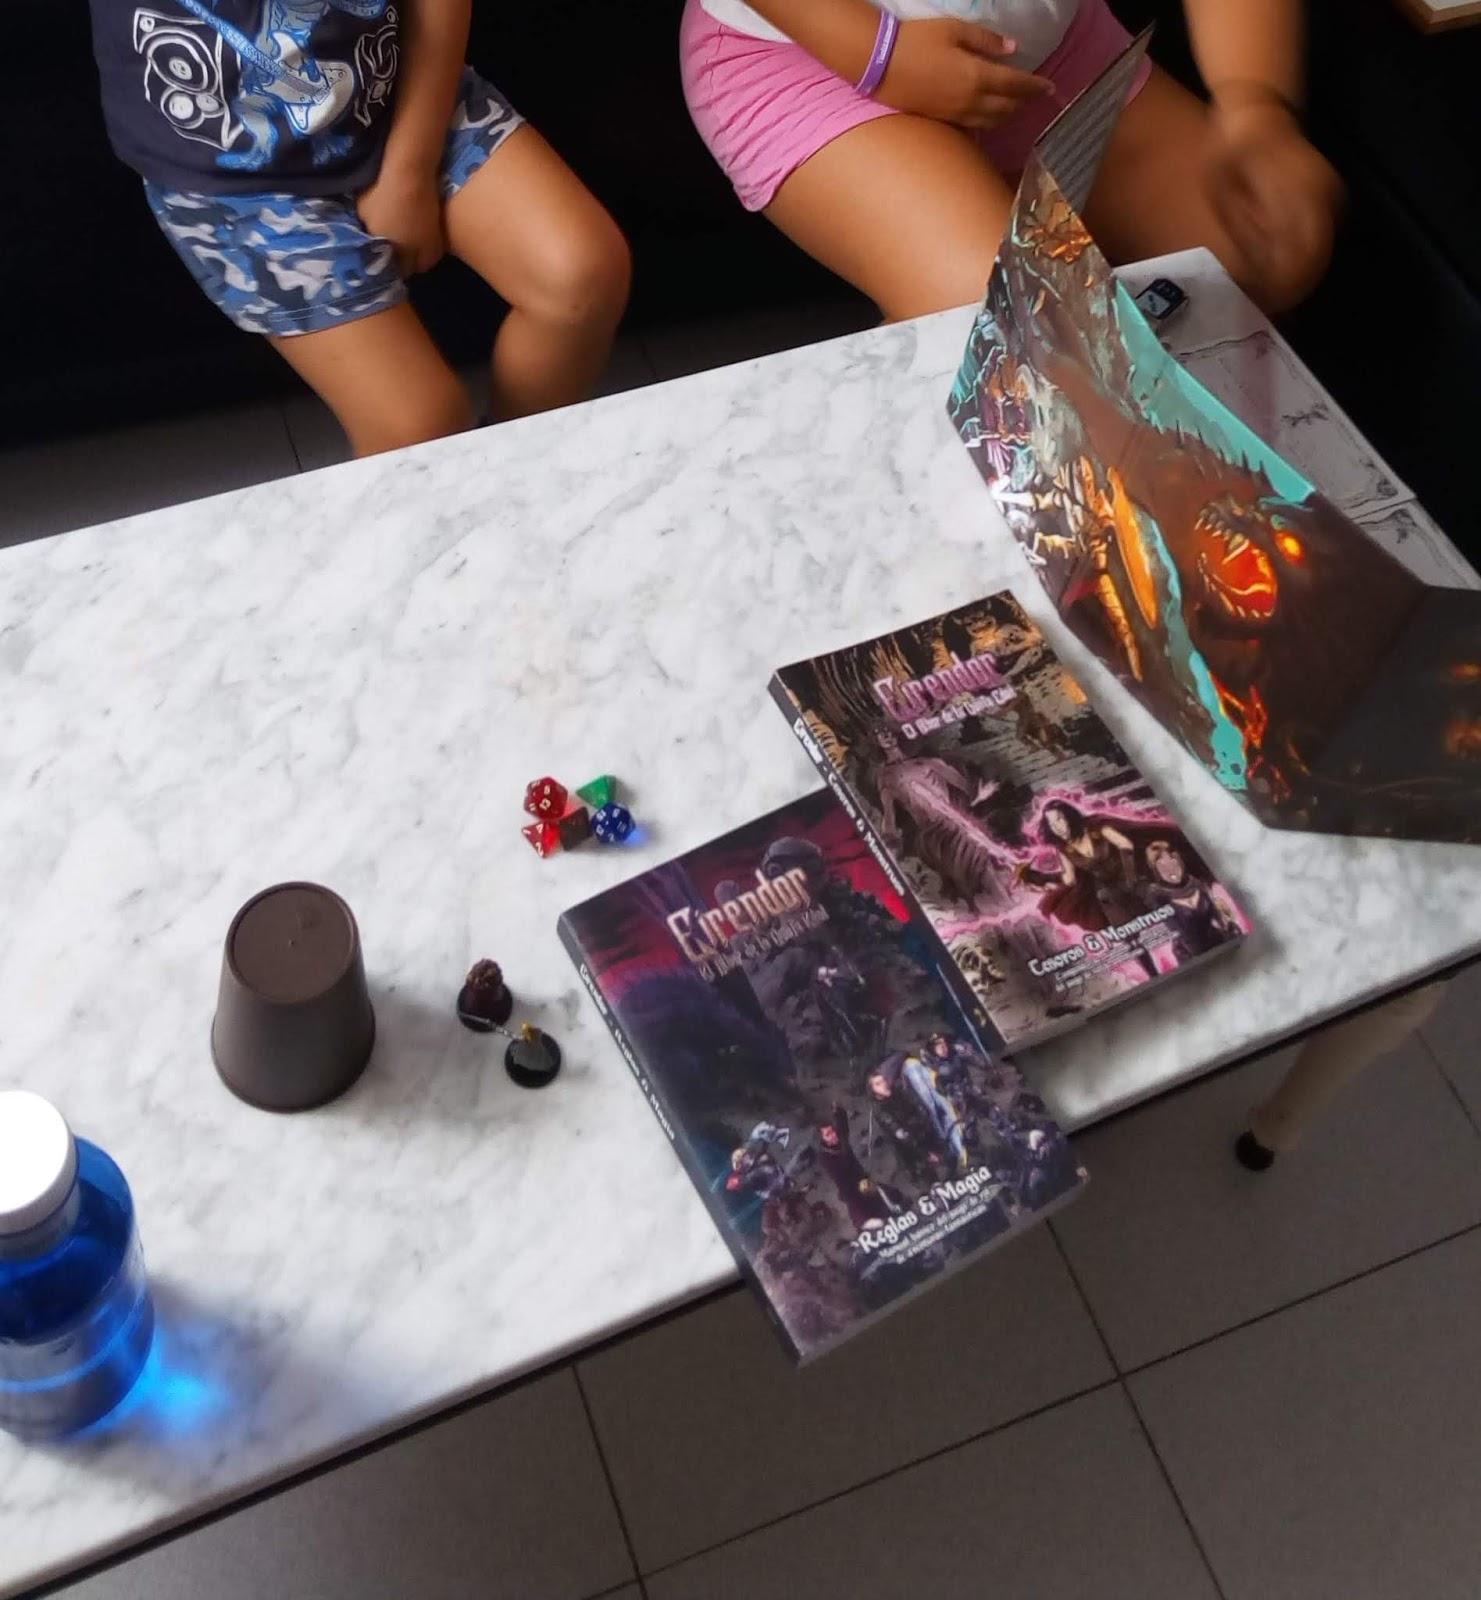 Jugando con tus hijos pequeños a Eirendor - D&D 5e